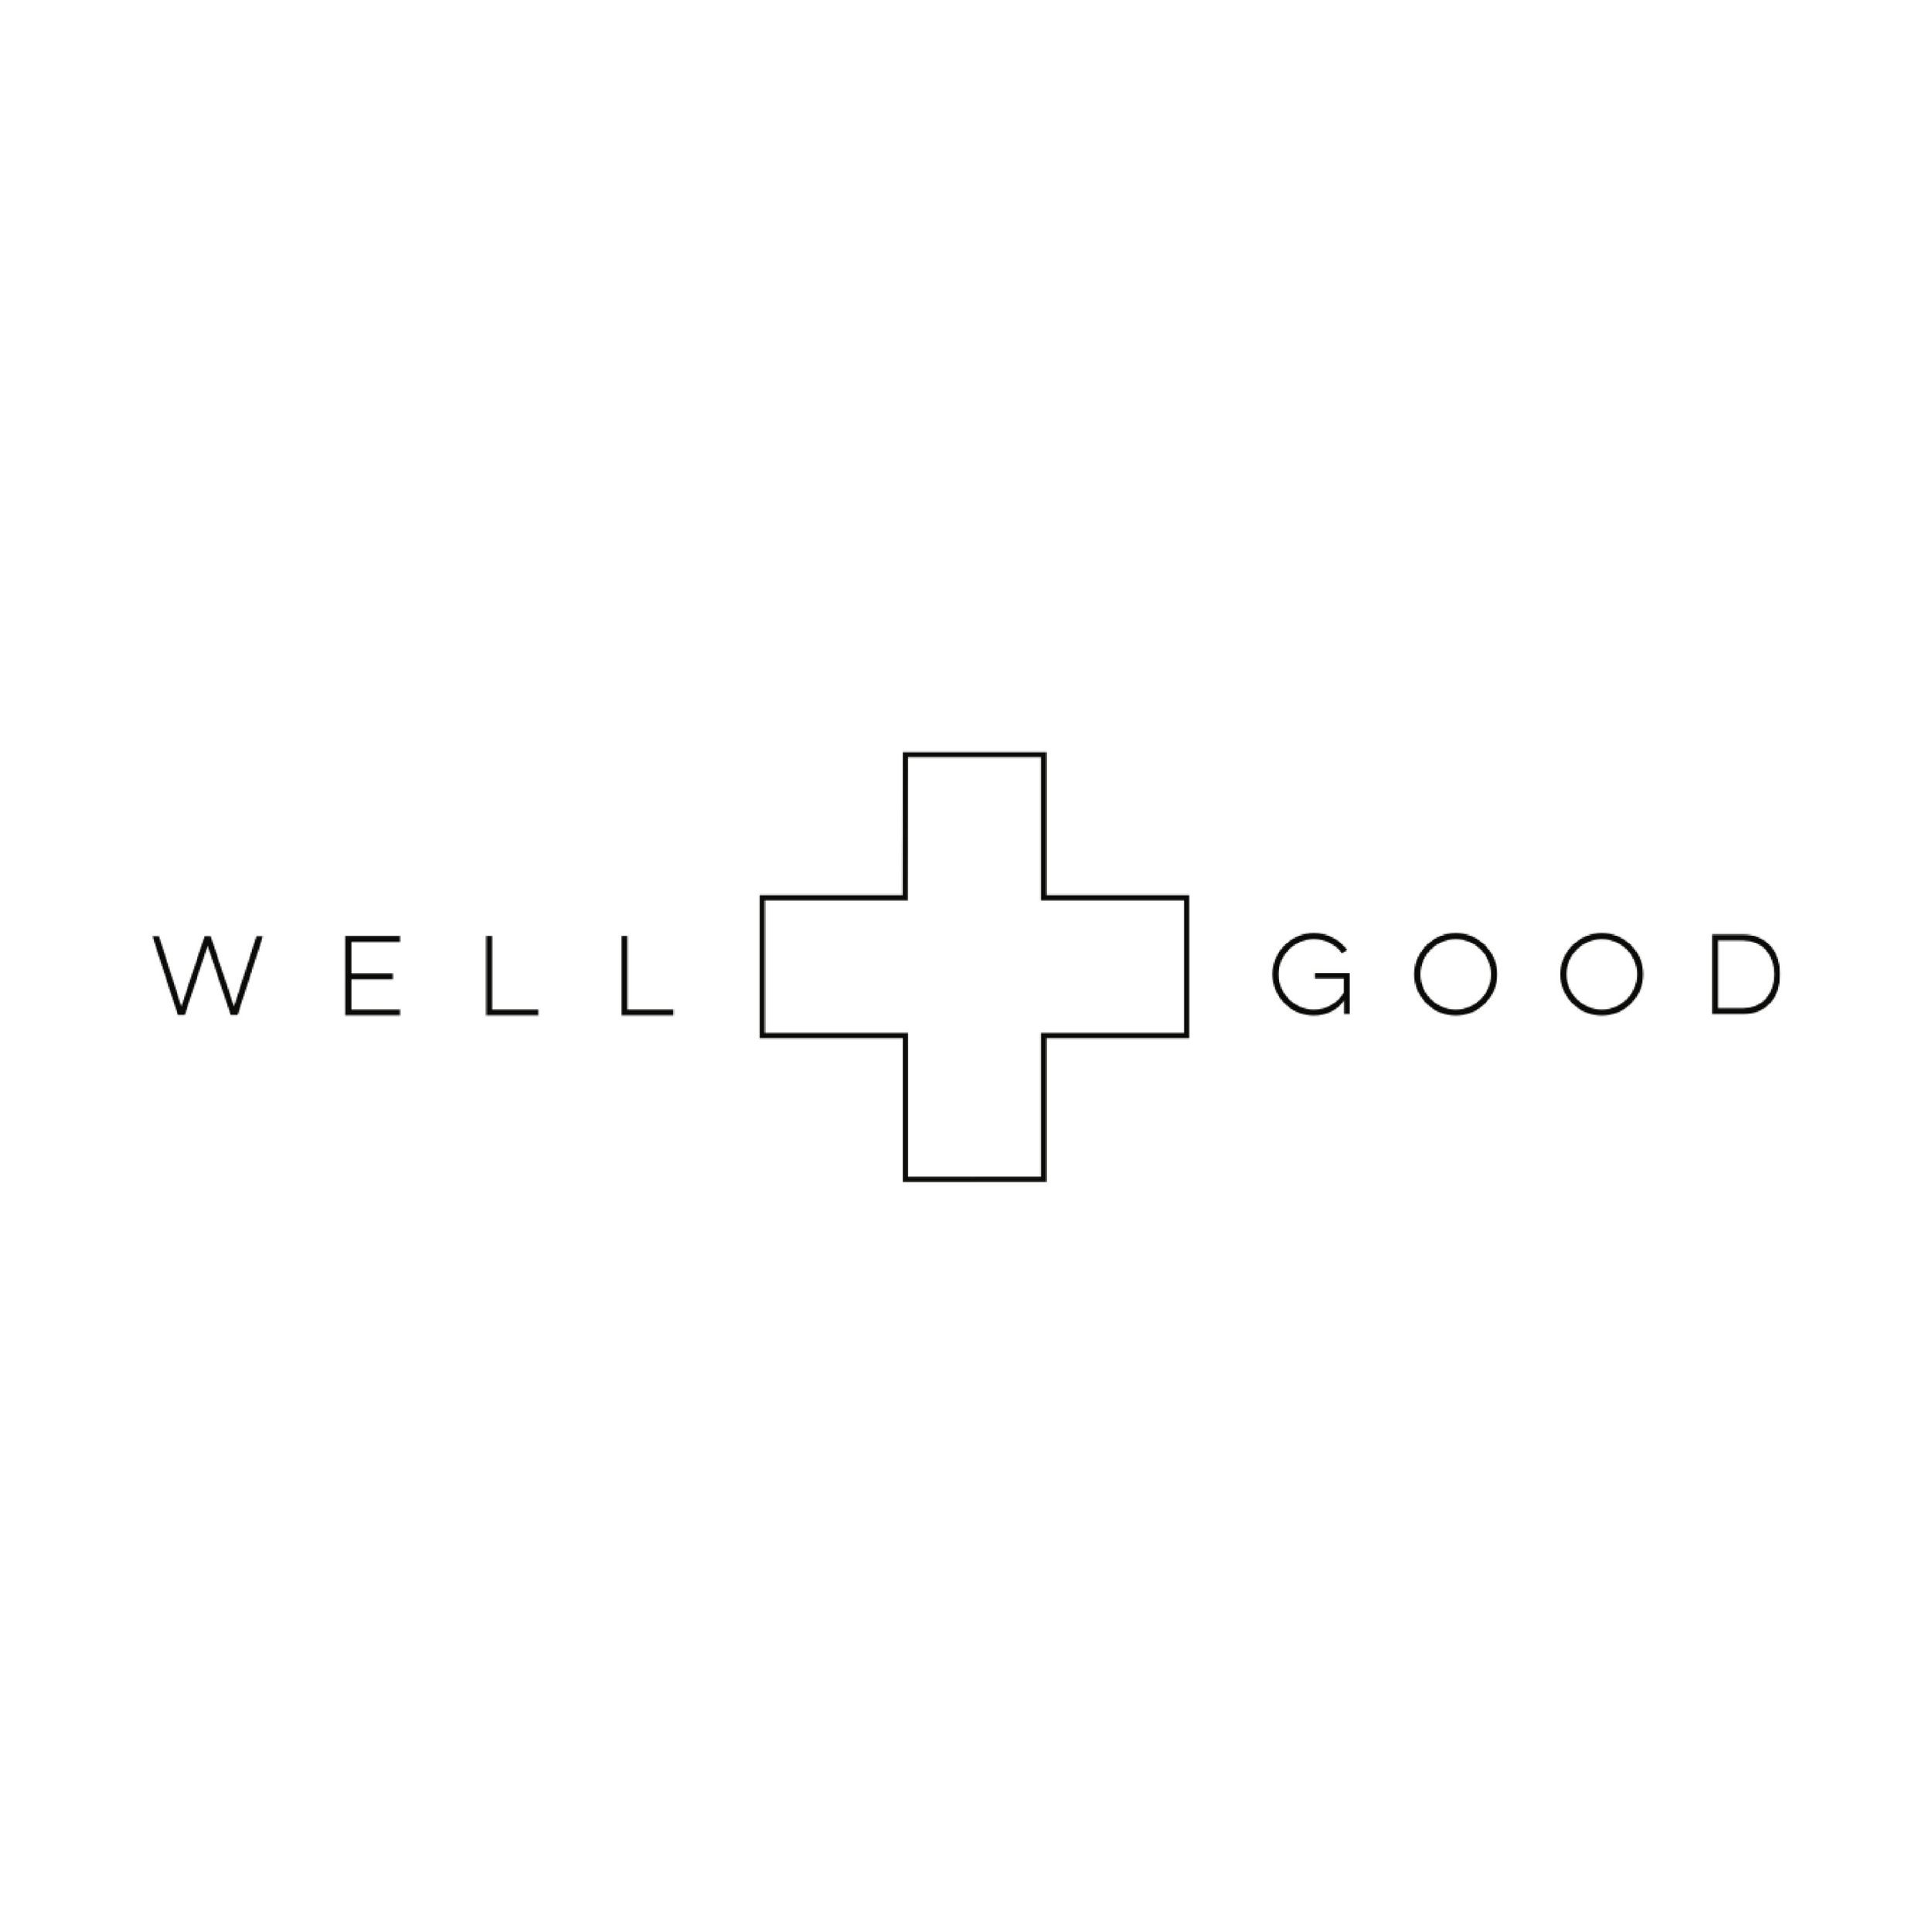 well_and_good_logo-01 (1).jpg